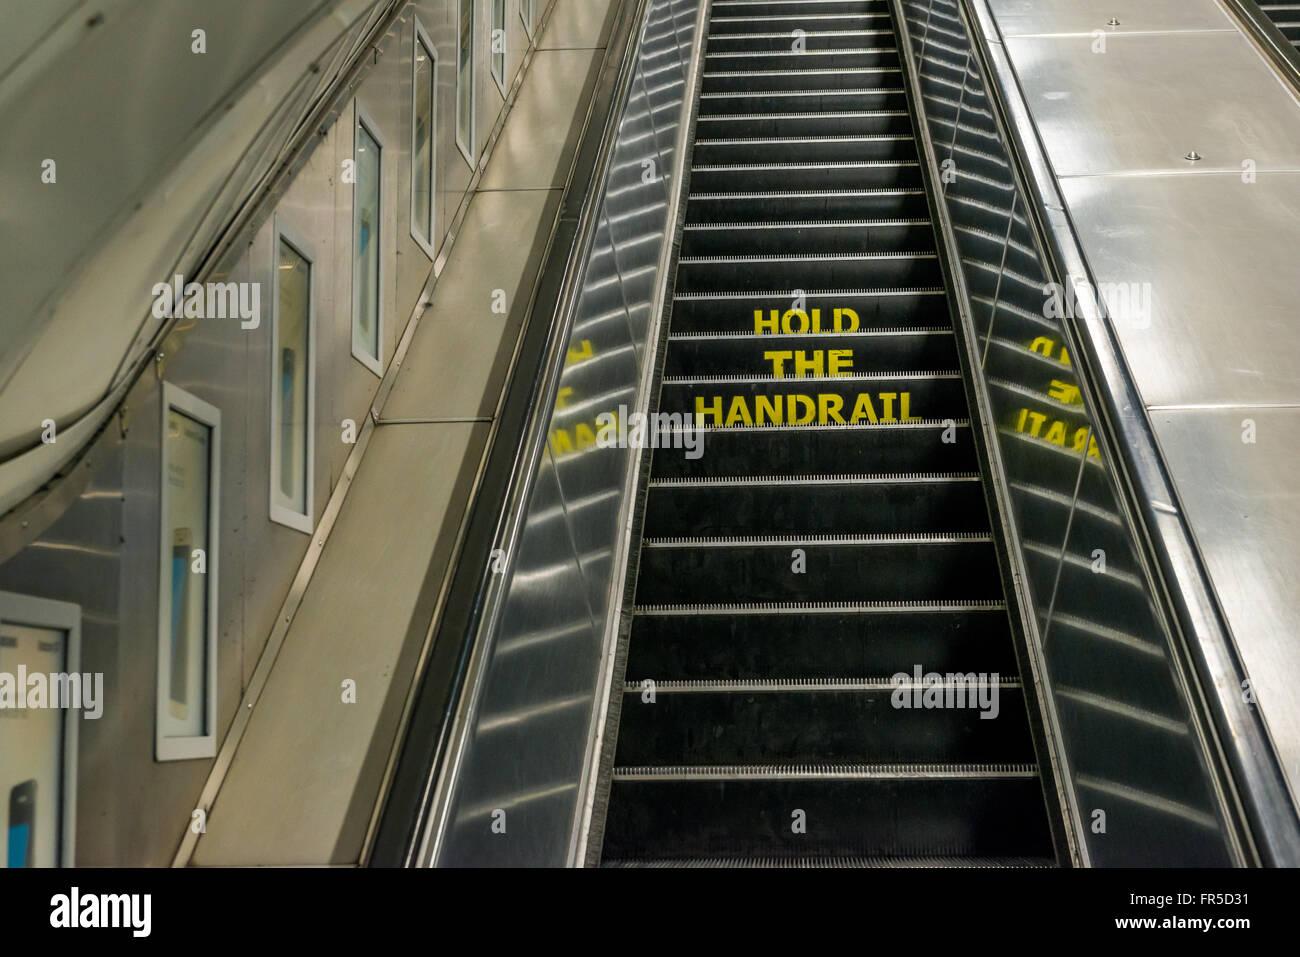 London, United Kingdom - March 20, 2016: Hold the Handrail notice on an escalator in London Underground, Euston - Stock Image